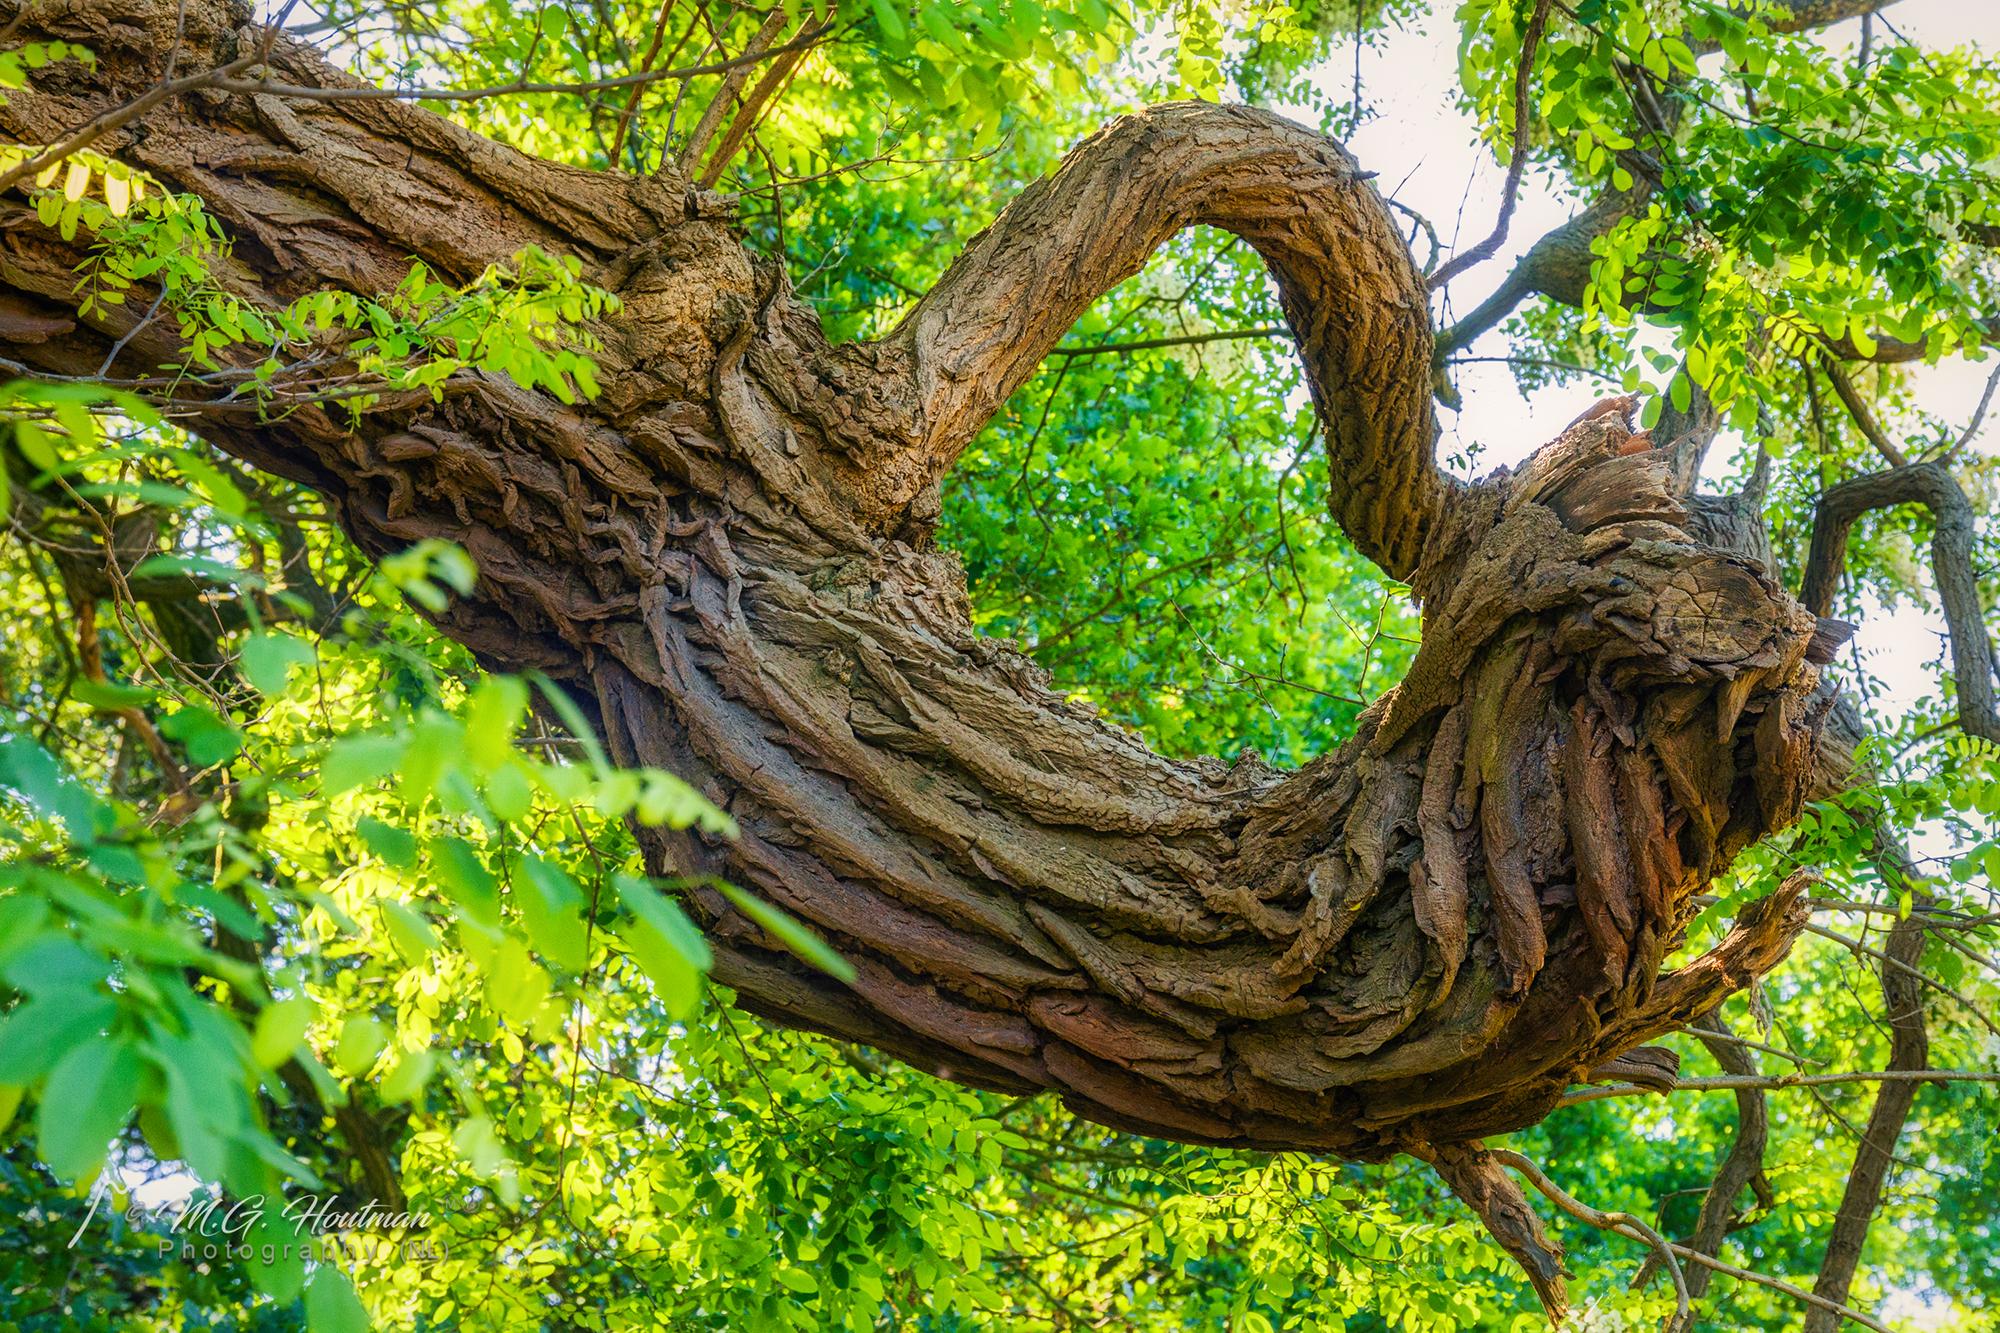 The old sunny tree